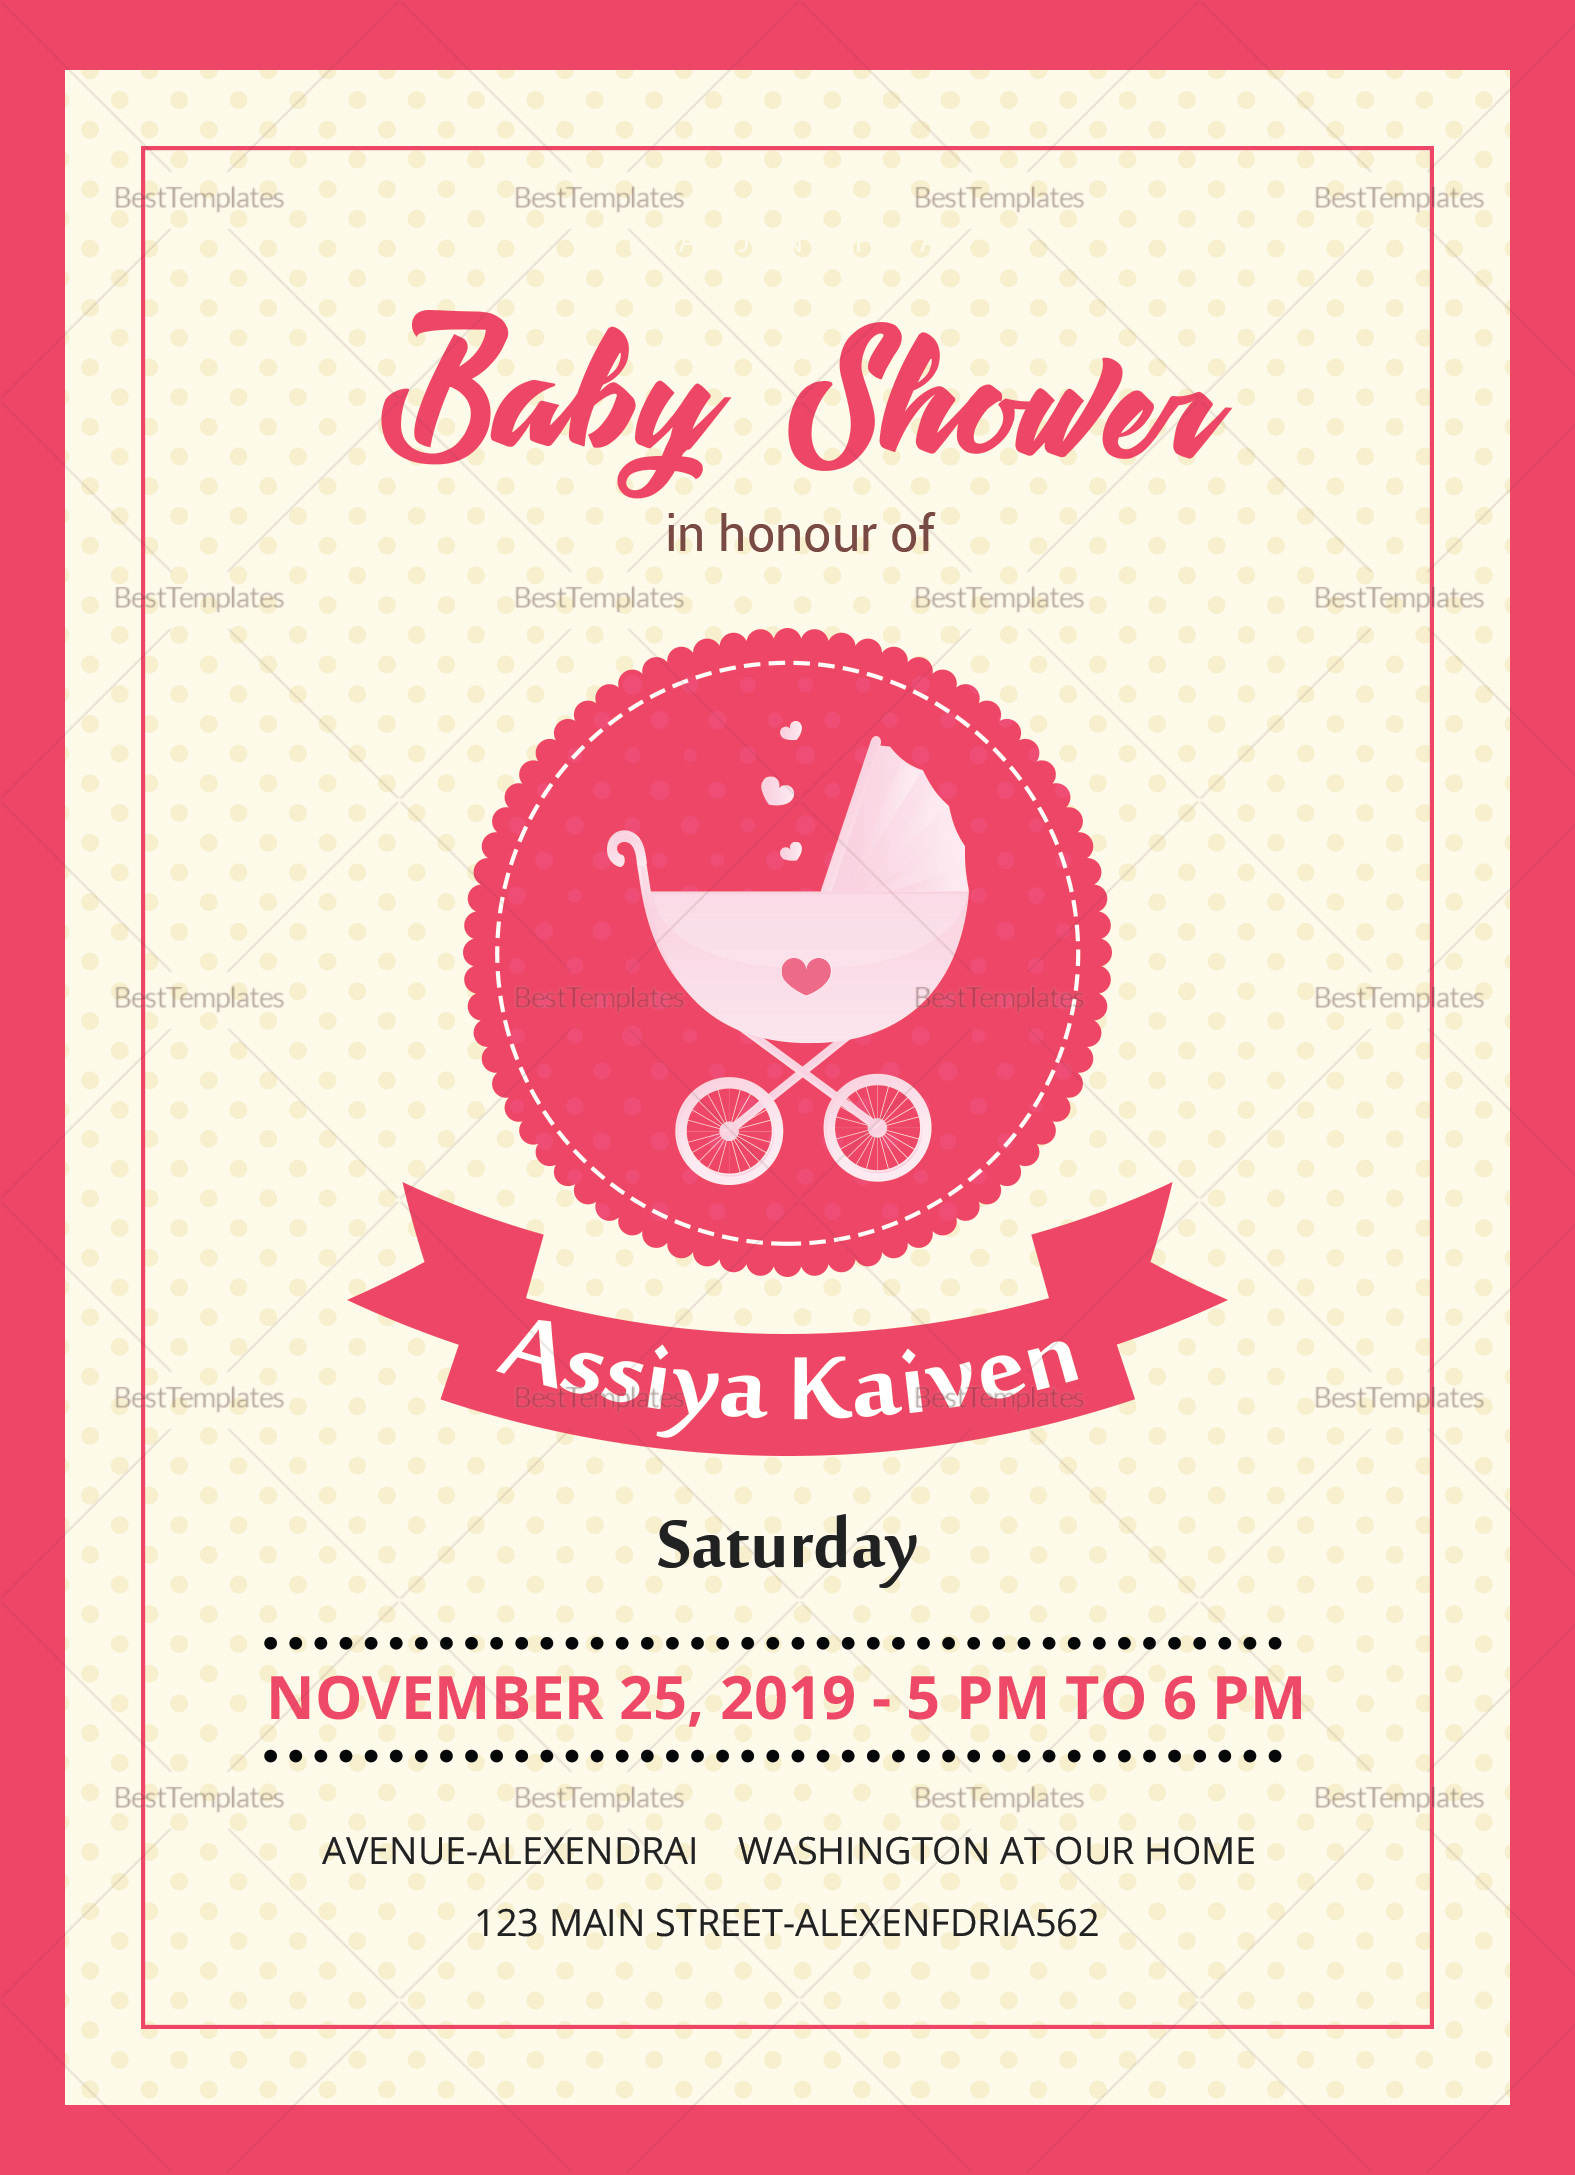 Classic Baby Shower Invitation Design Template